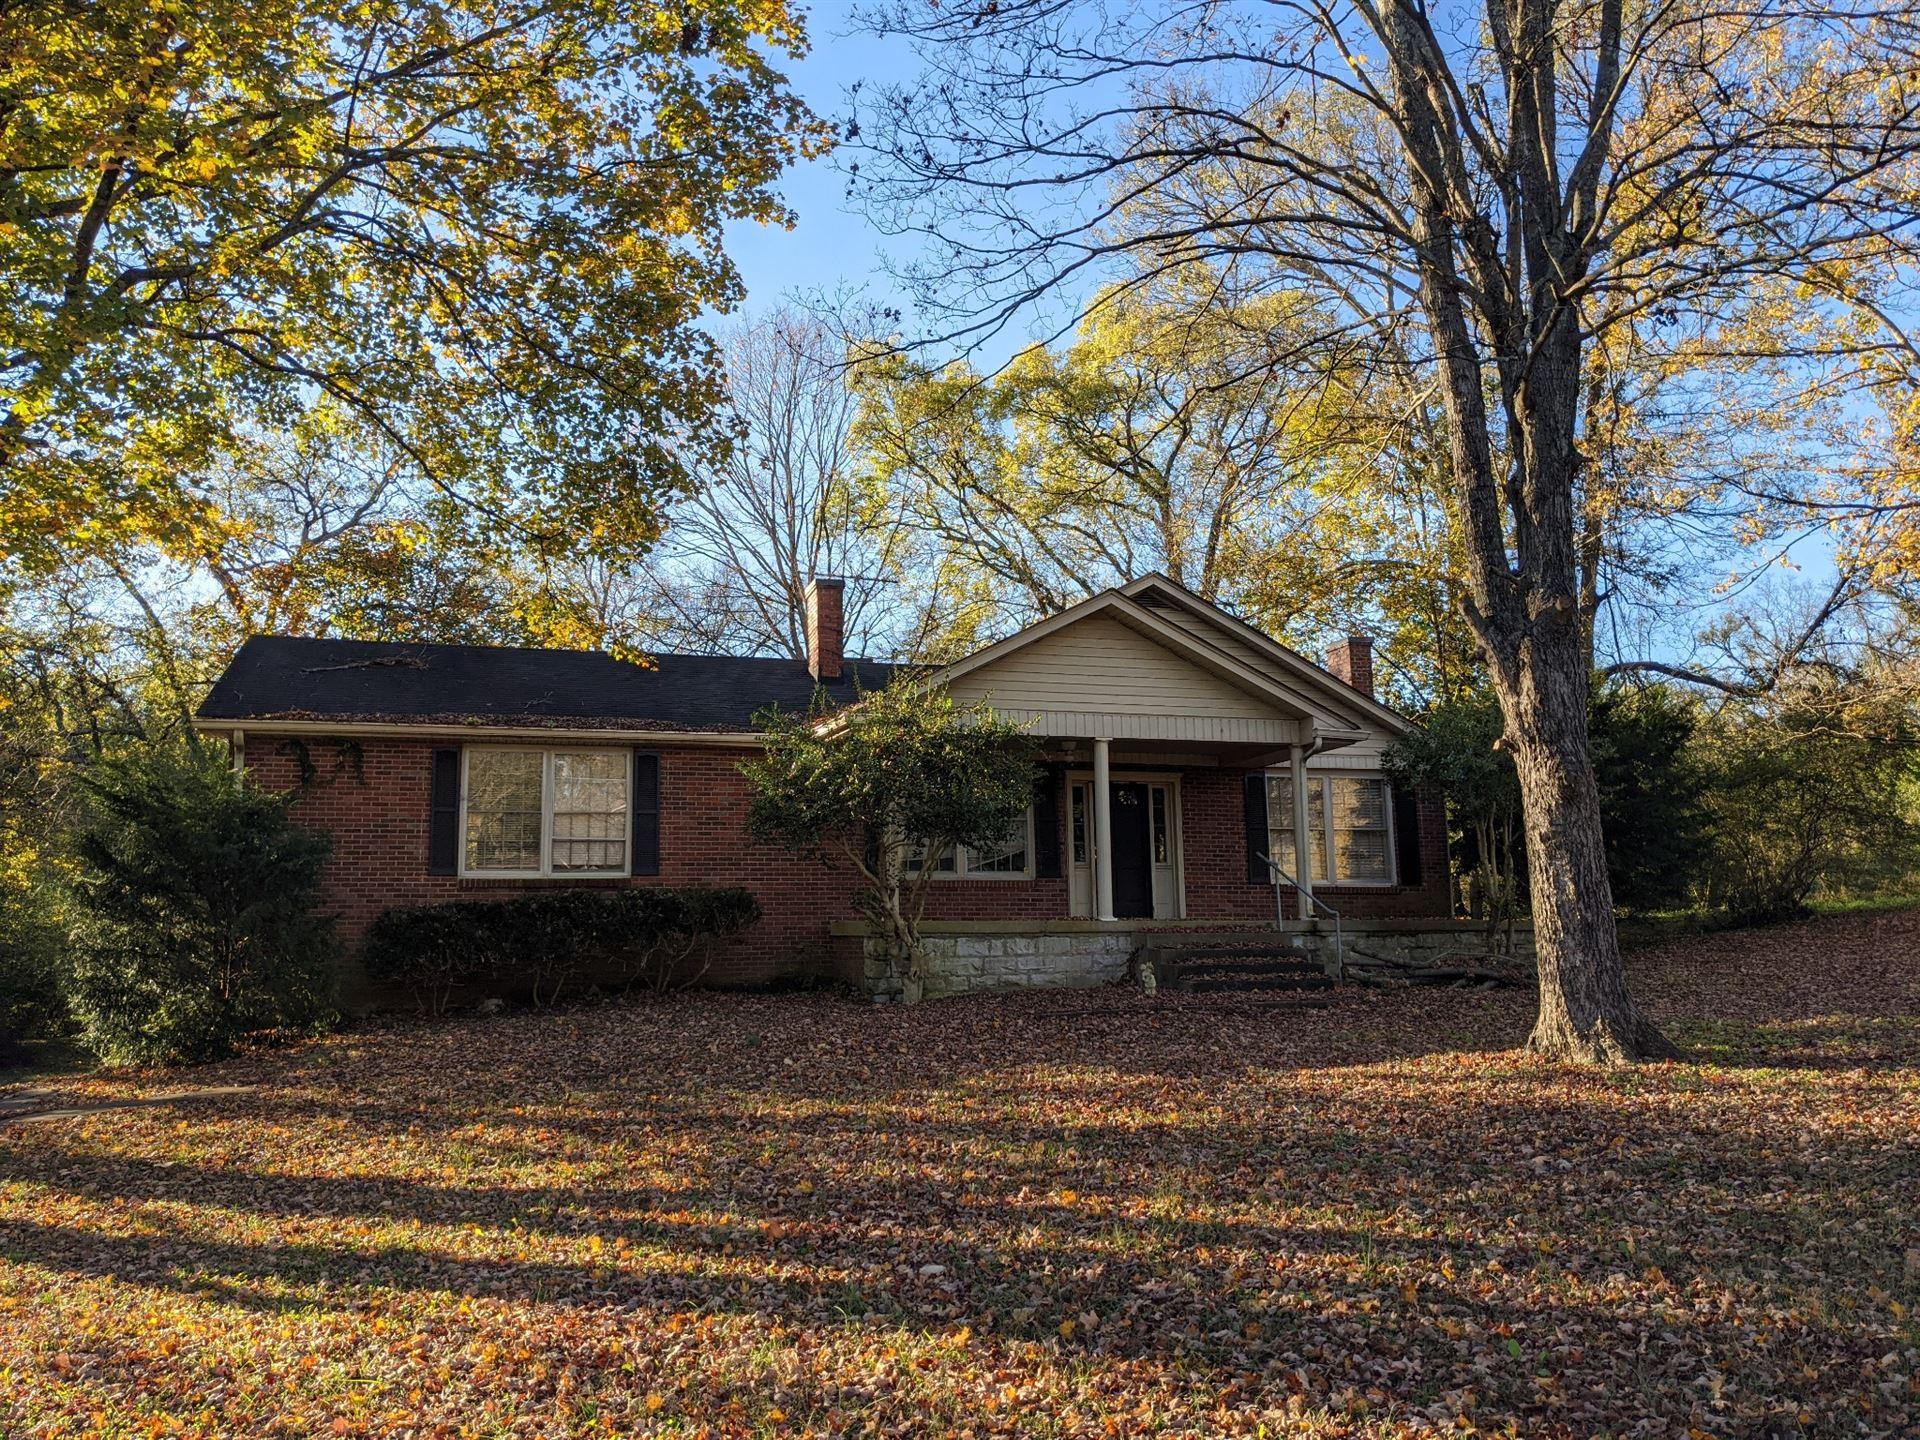 805 S Dickerson Rd, Goodlettsville, TN 37072 - MLS#: 2205666